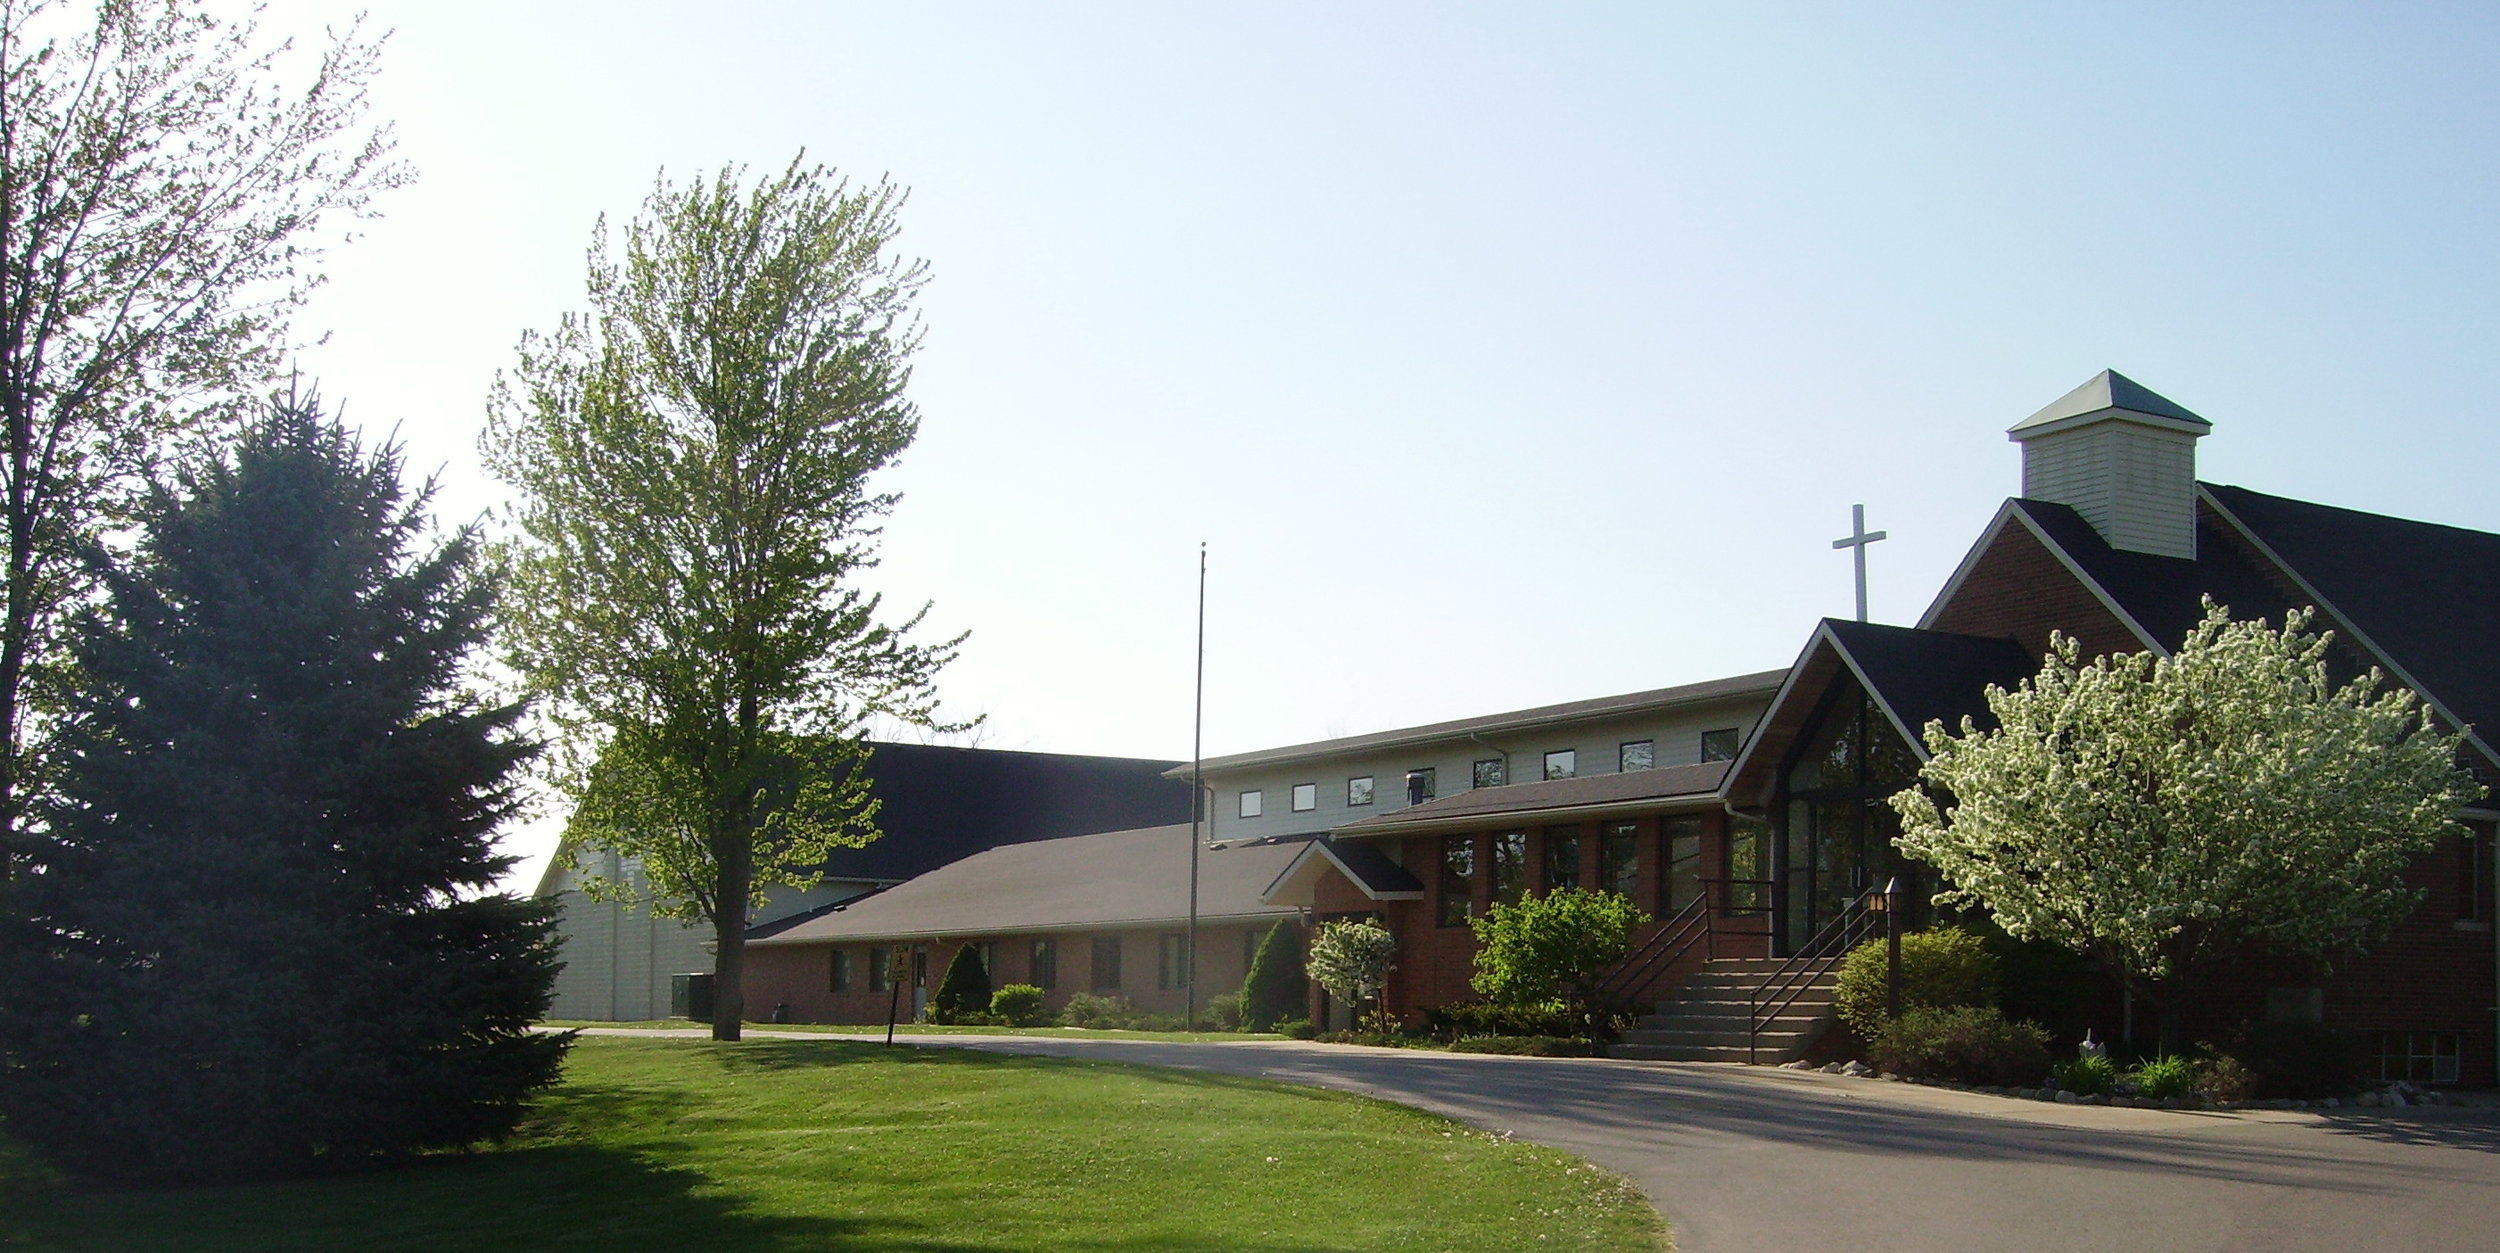 church spring pic.jpg